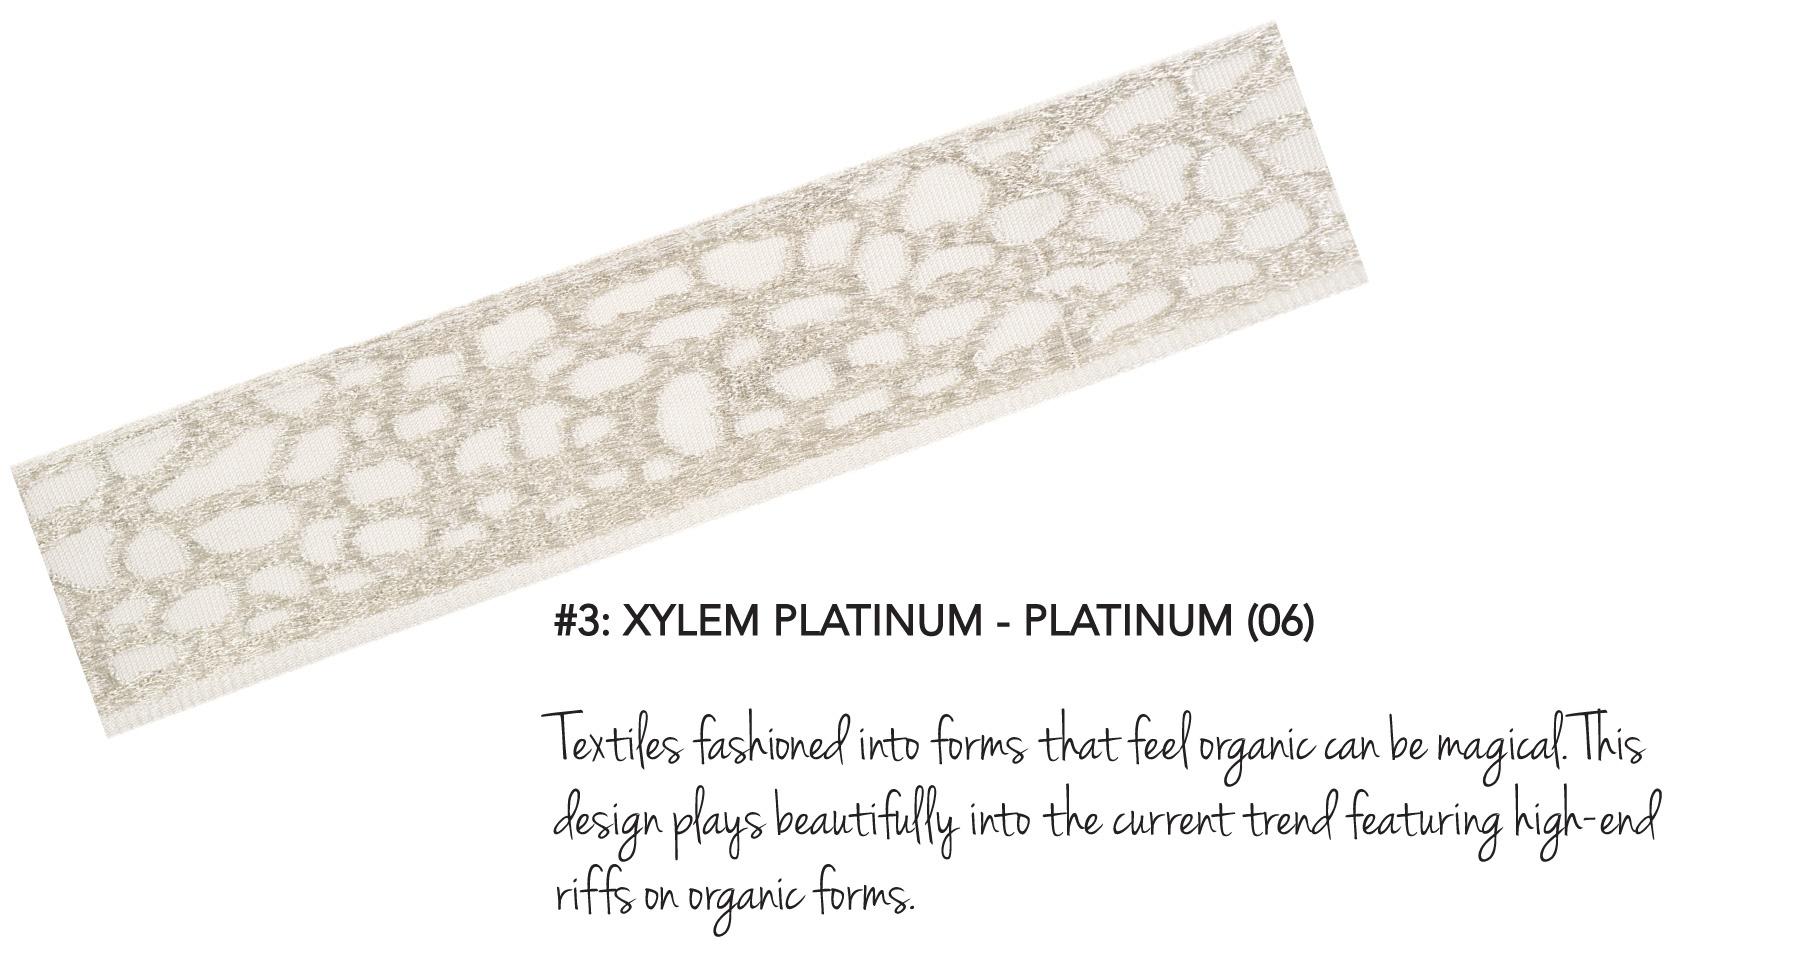 Xylem_Platinum_#3